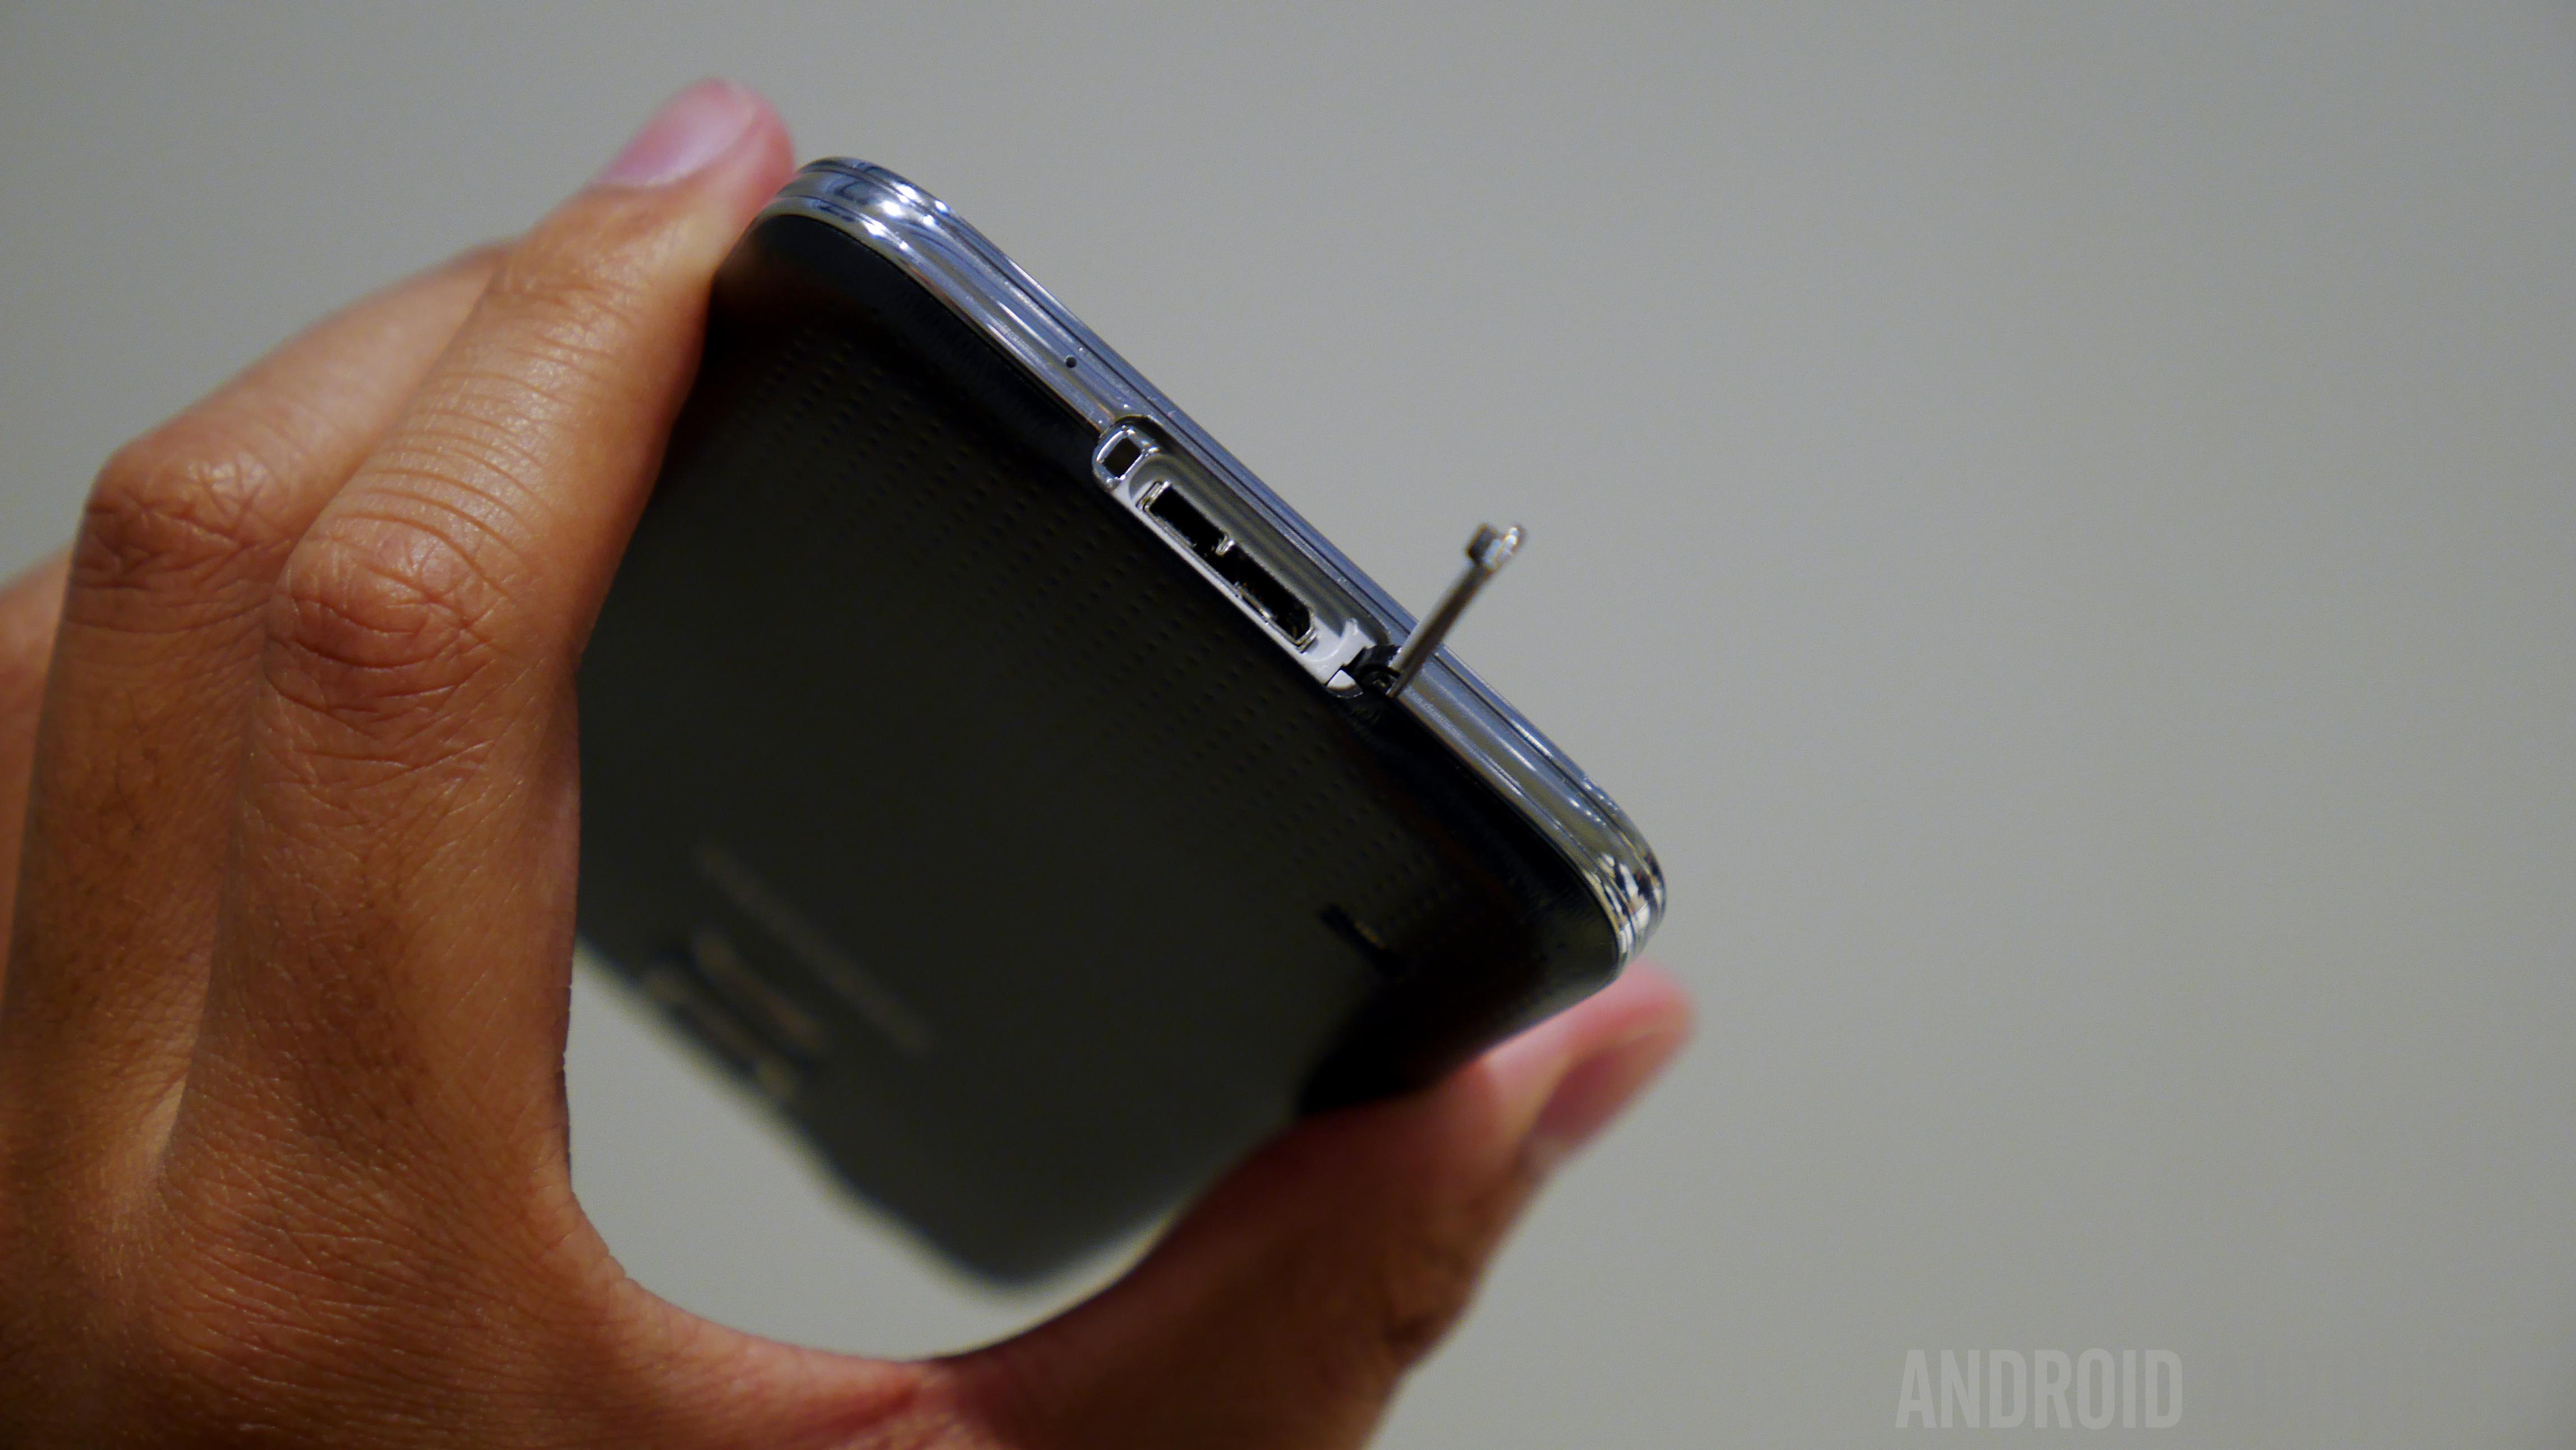 Samsung Galaxy S5 Hands on MWC 2014-1160070